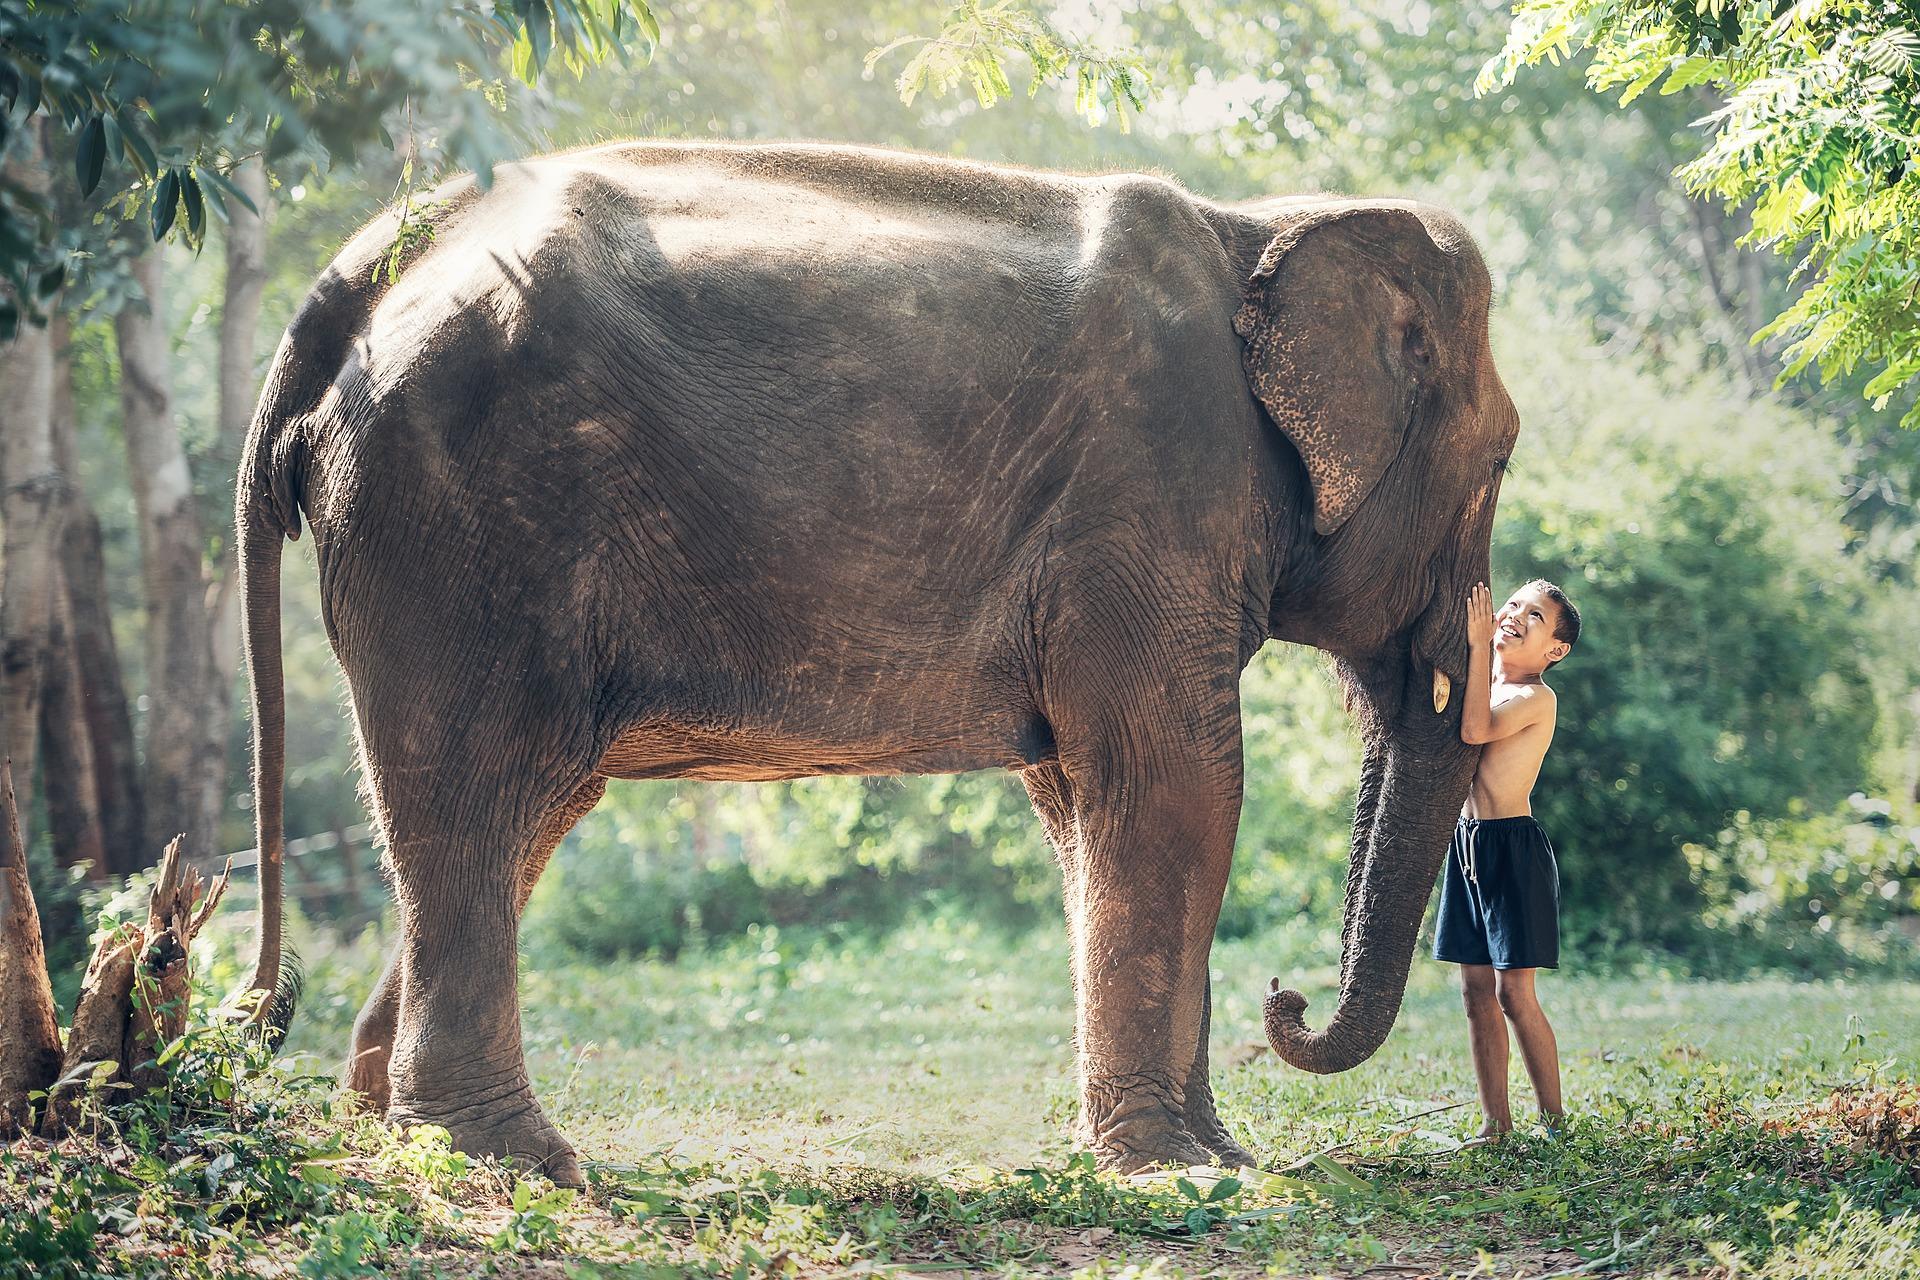 Kid with the elephant photo